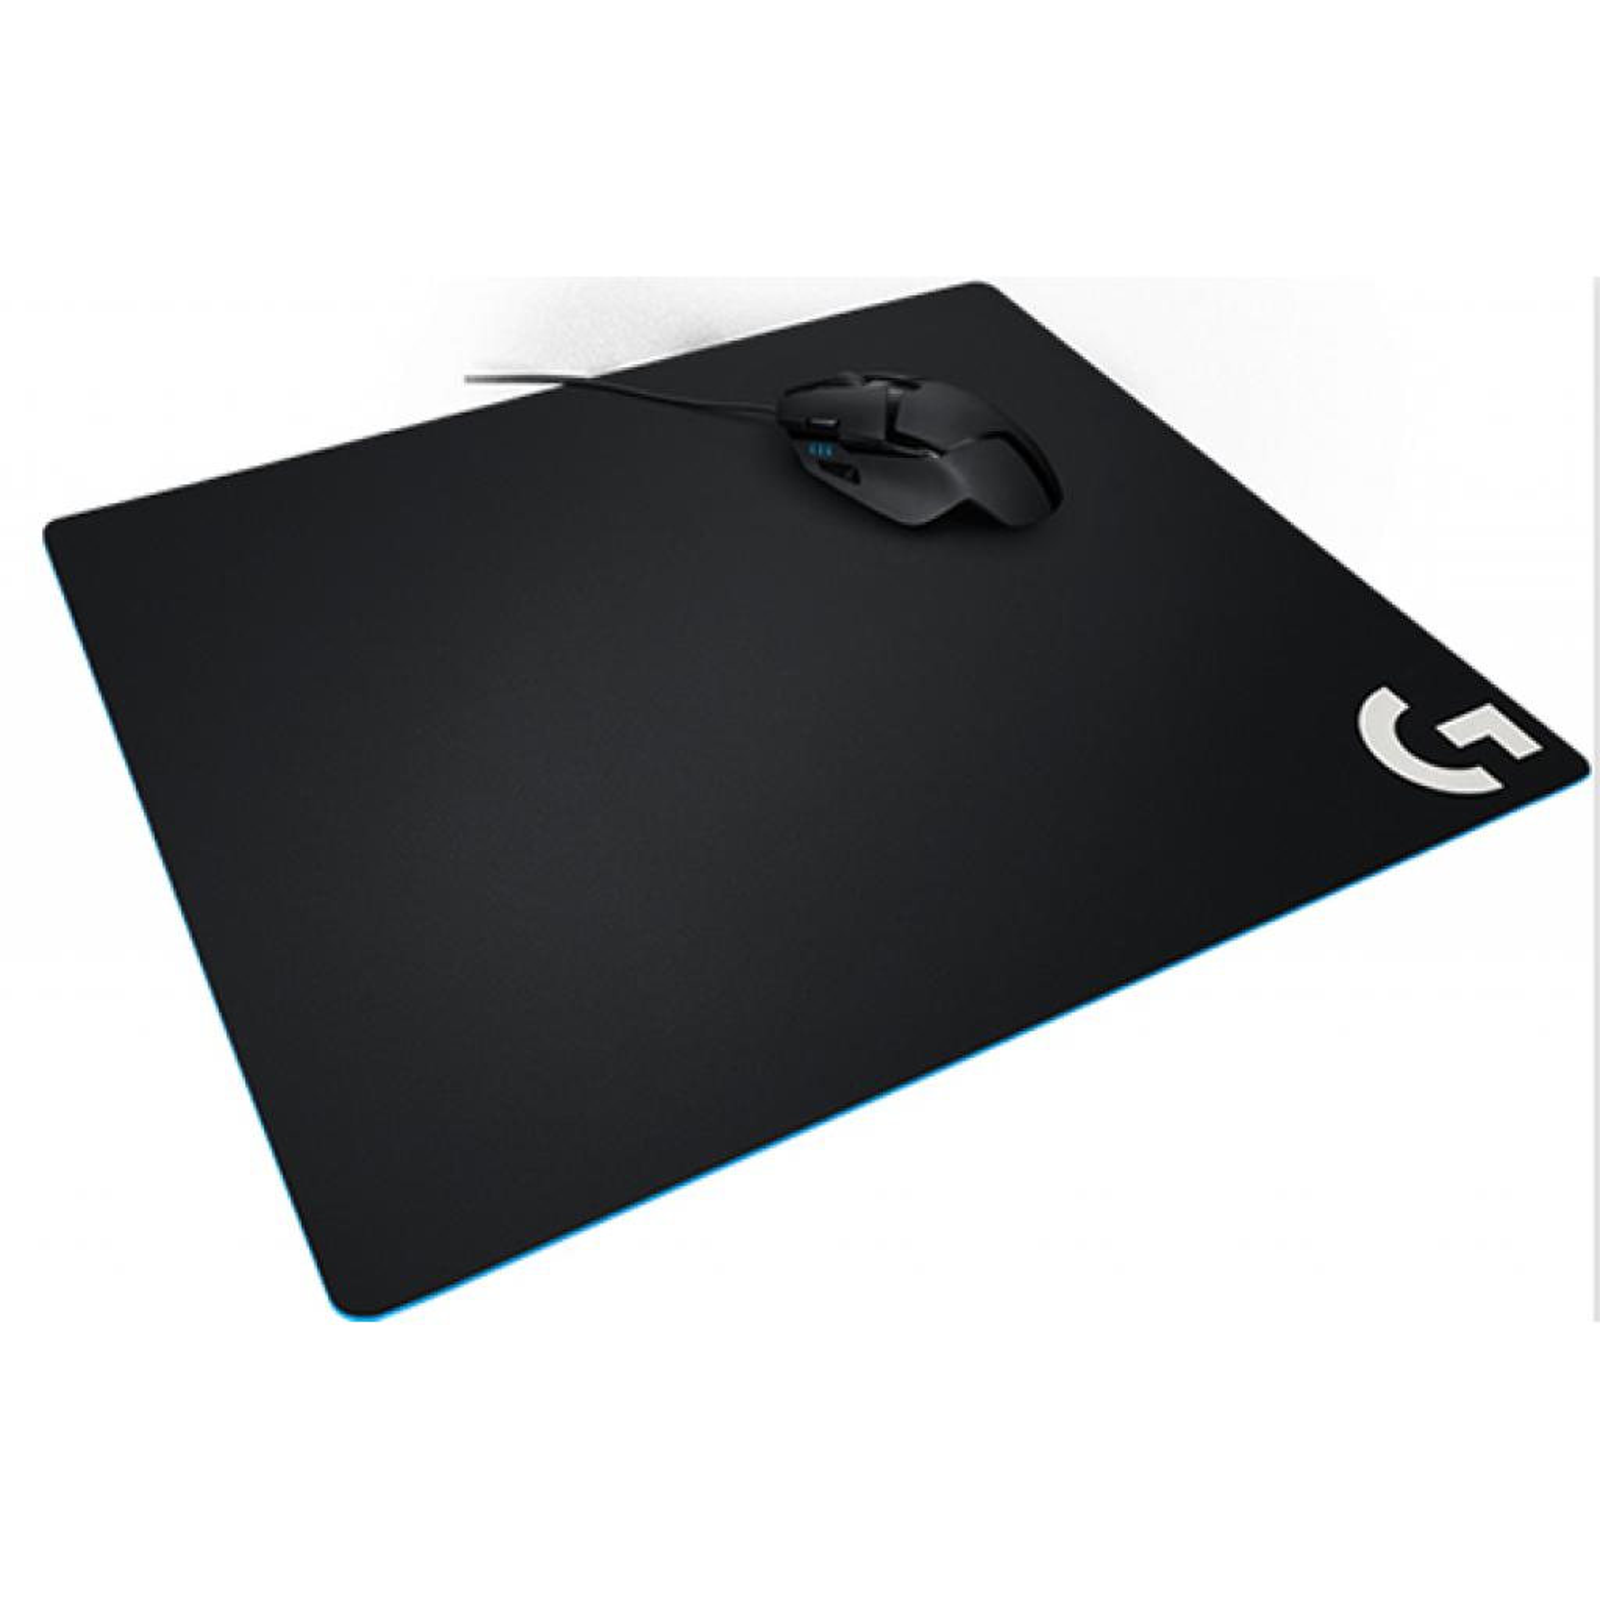 Коврик Logitech G640 Cloth Gaming Mouse Pad (943-000089)